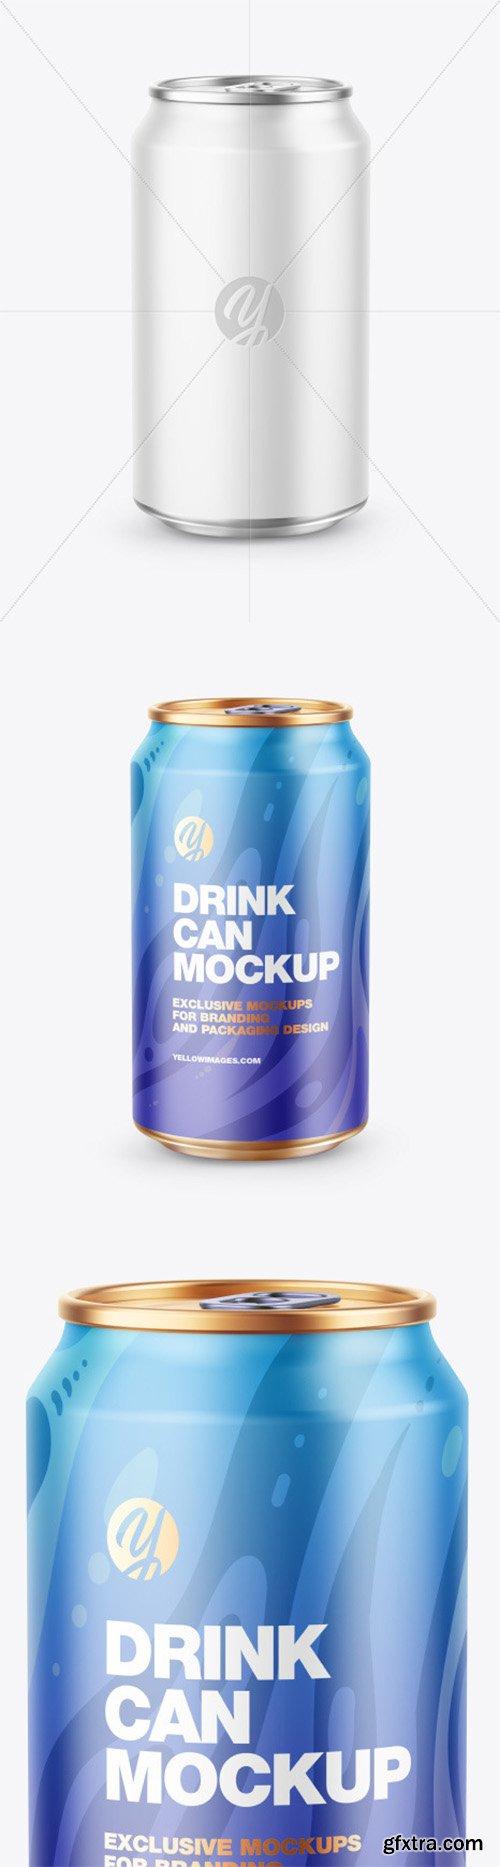 Metallic Drink Can w/ Matte Finish Mockup 80826